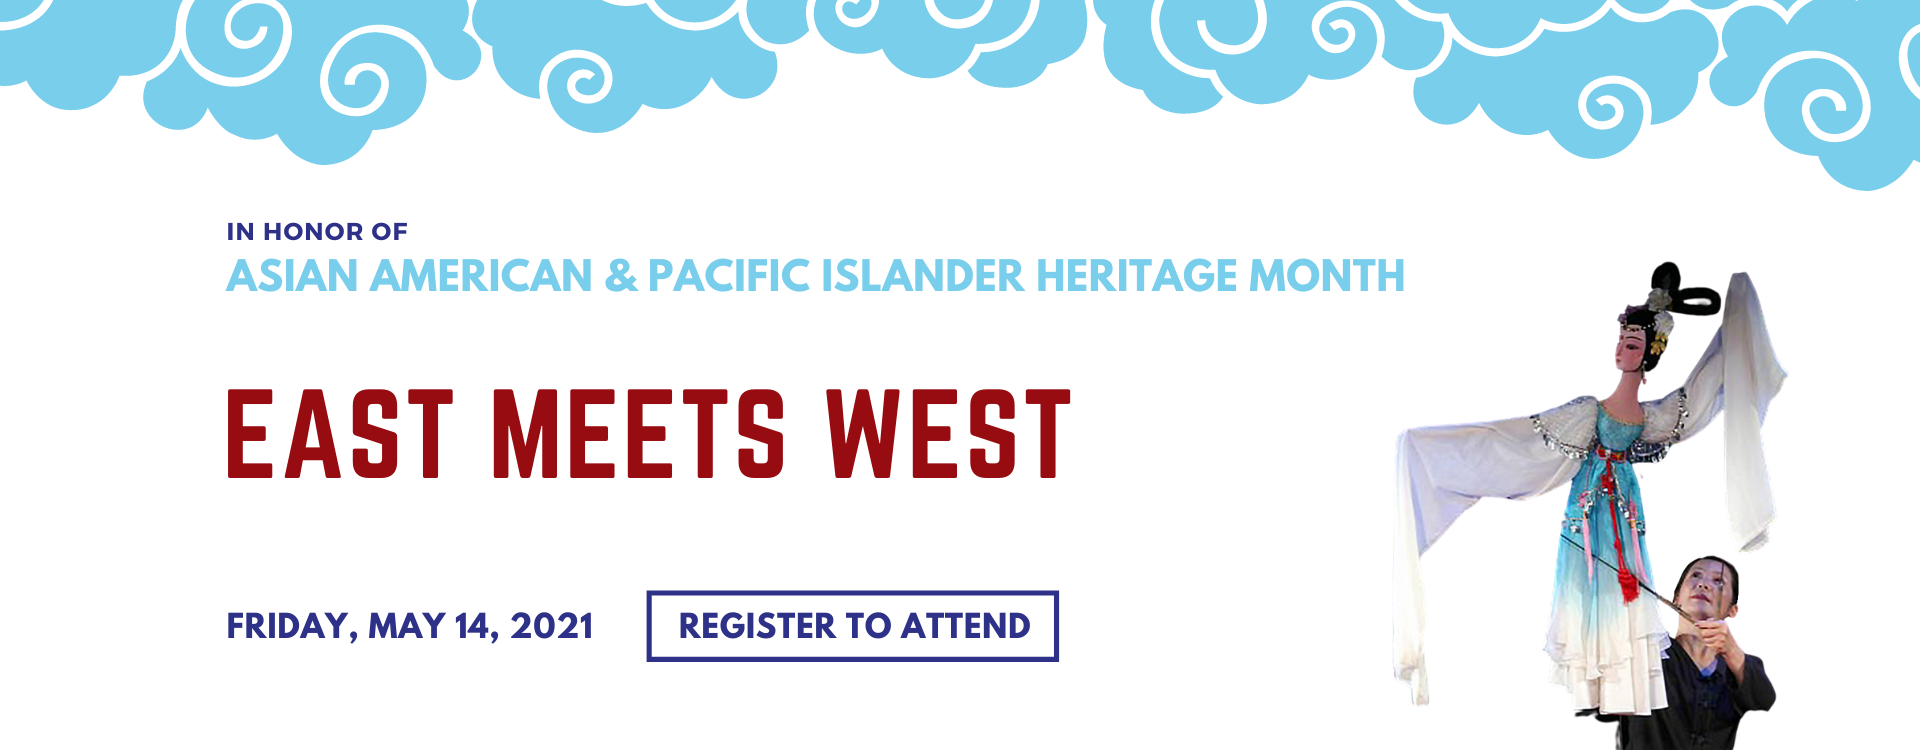 East Meets West with Hua Hua Zhang HPDTI